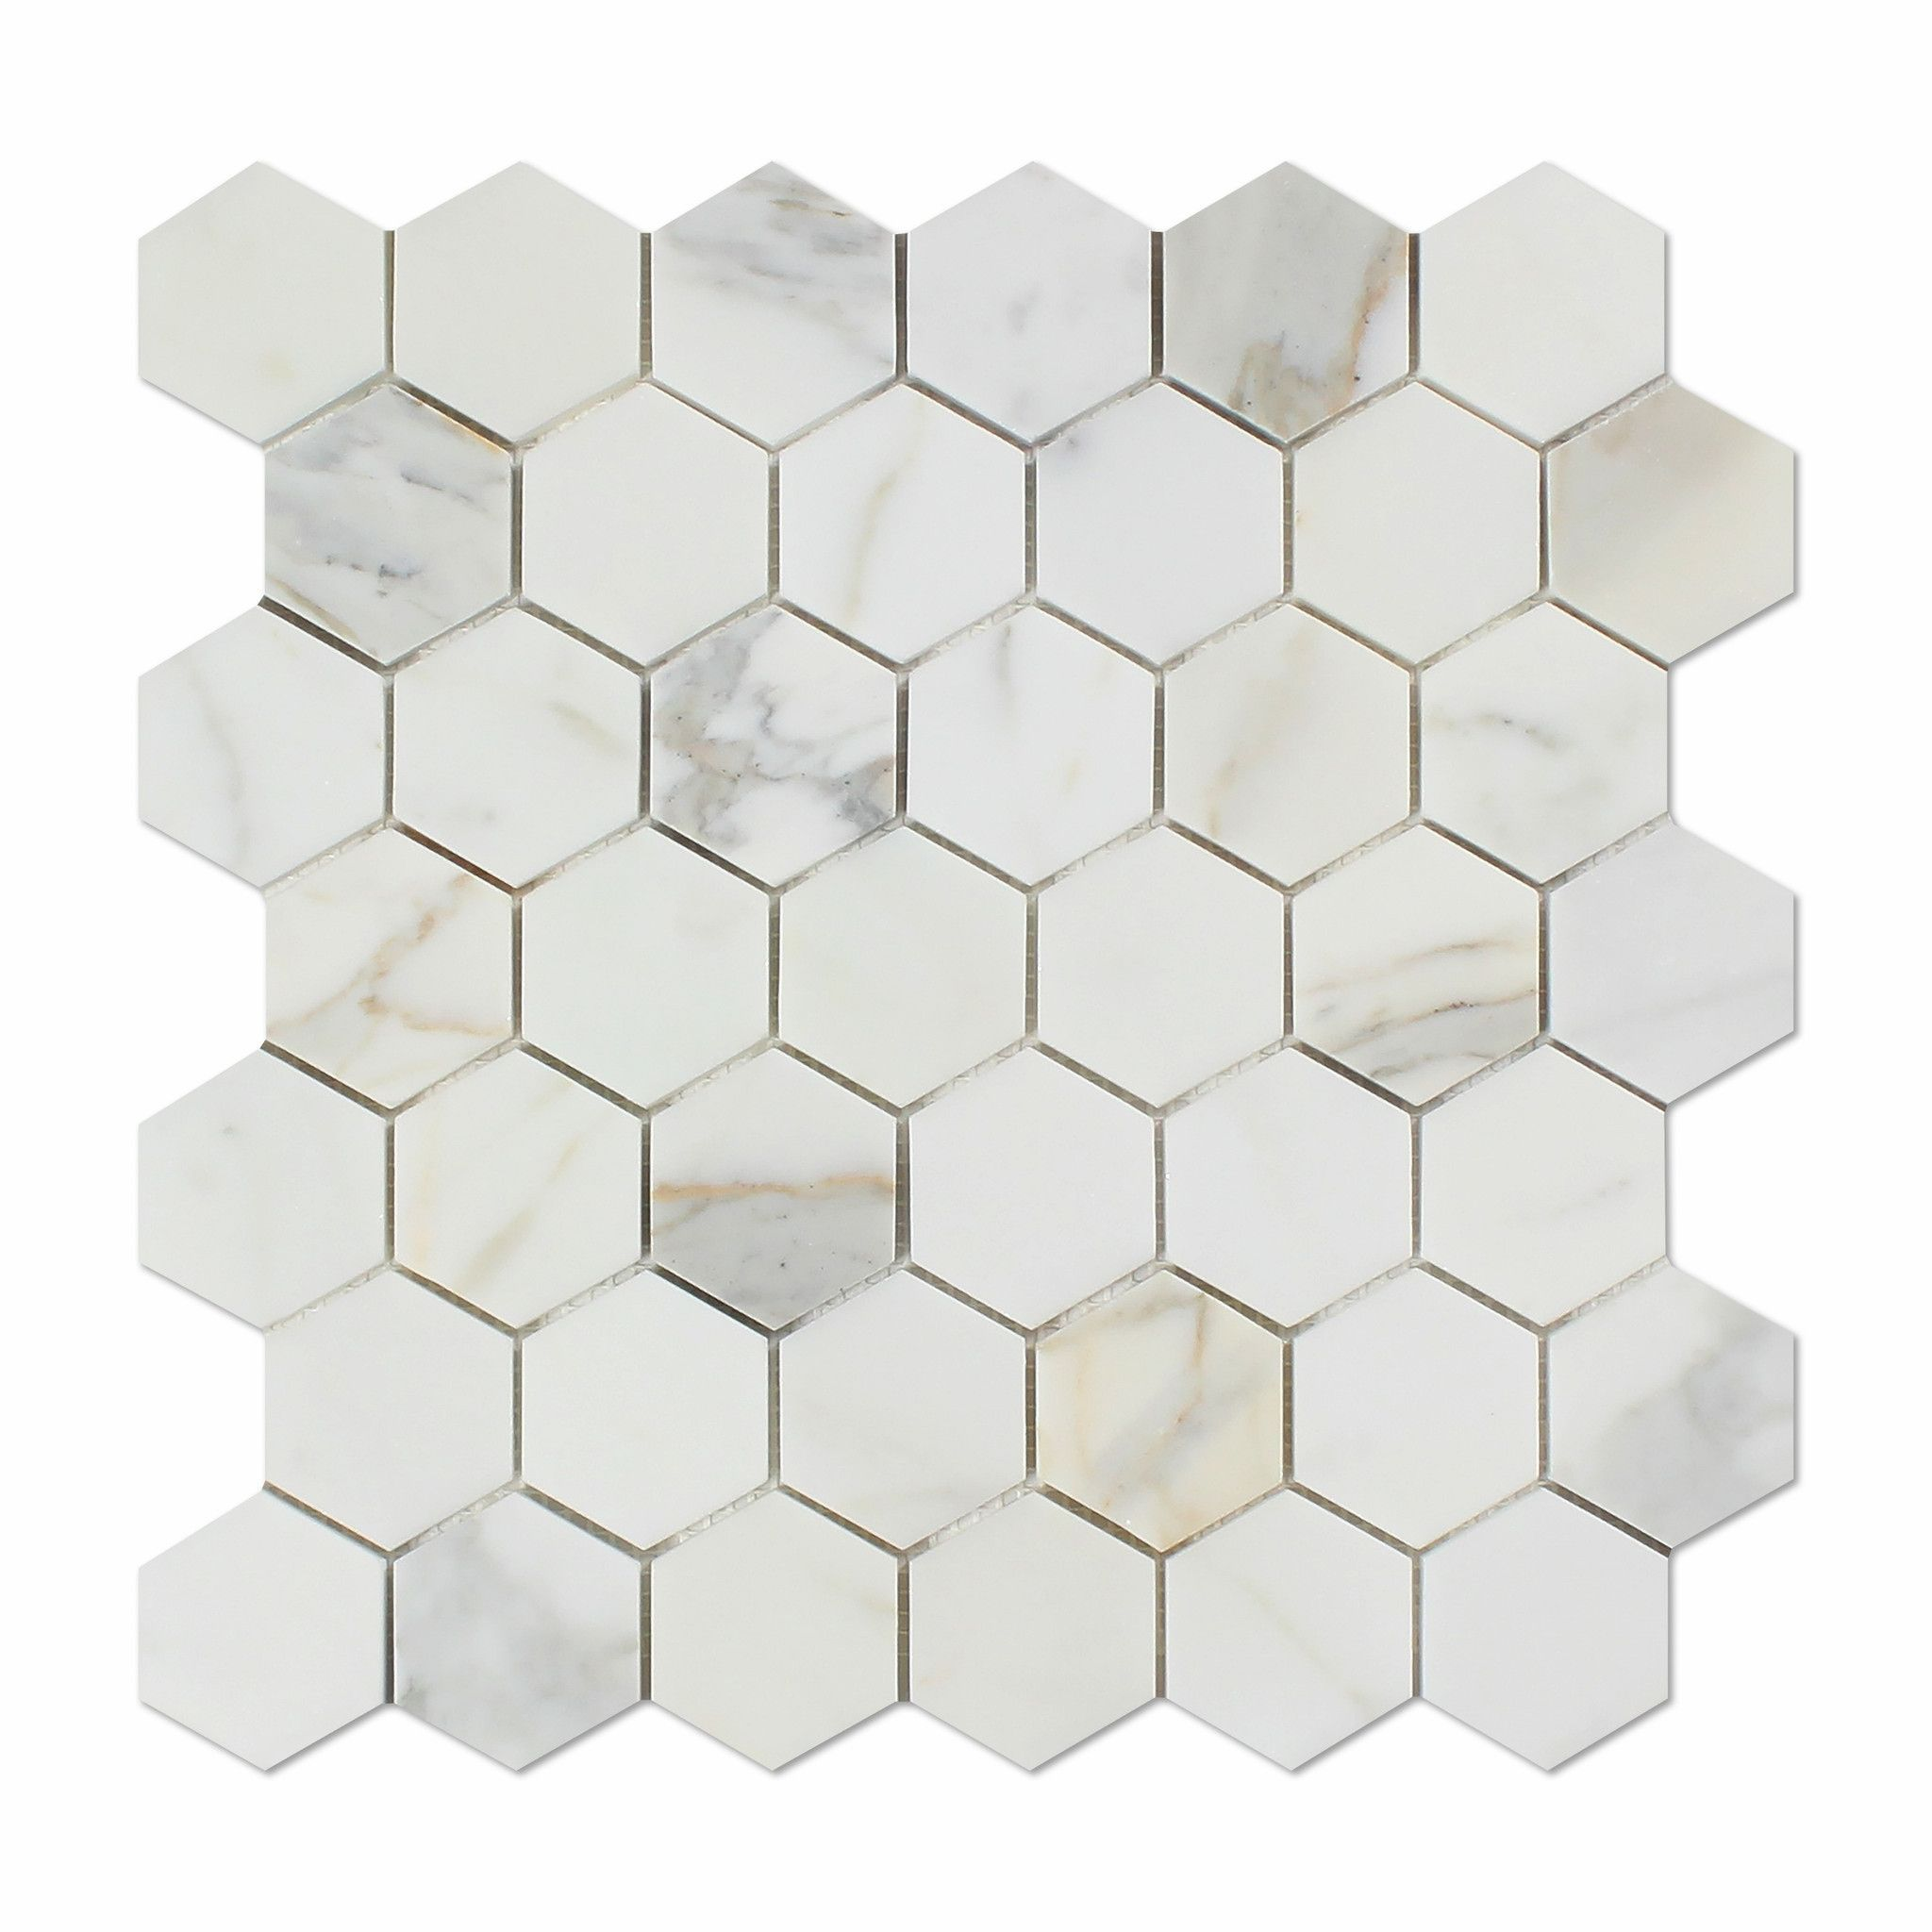 Calacatta Gold Marble Honed 2 Hexagon Mosaic Tile In 2020 Hexagon Mosaic Tile Calacatta Gold Marble Hexagonal Mosaic